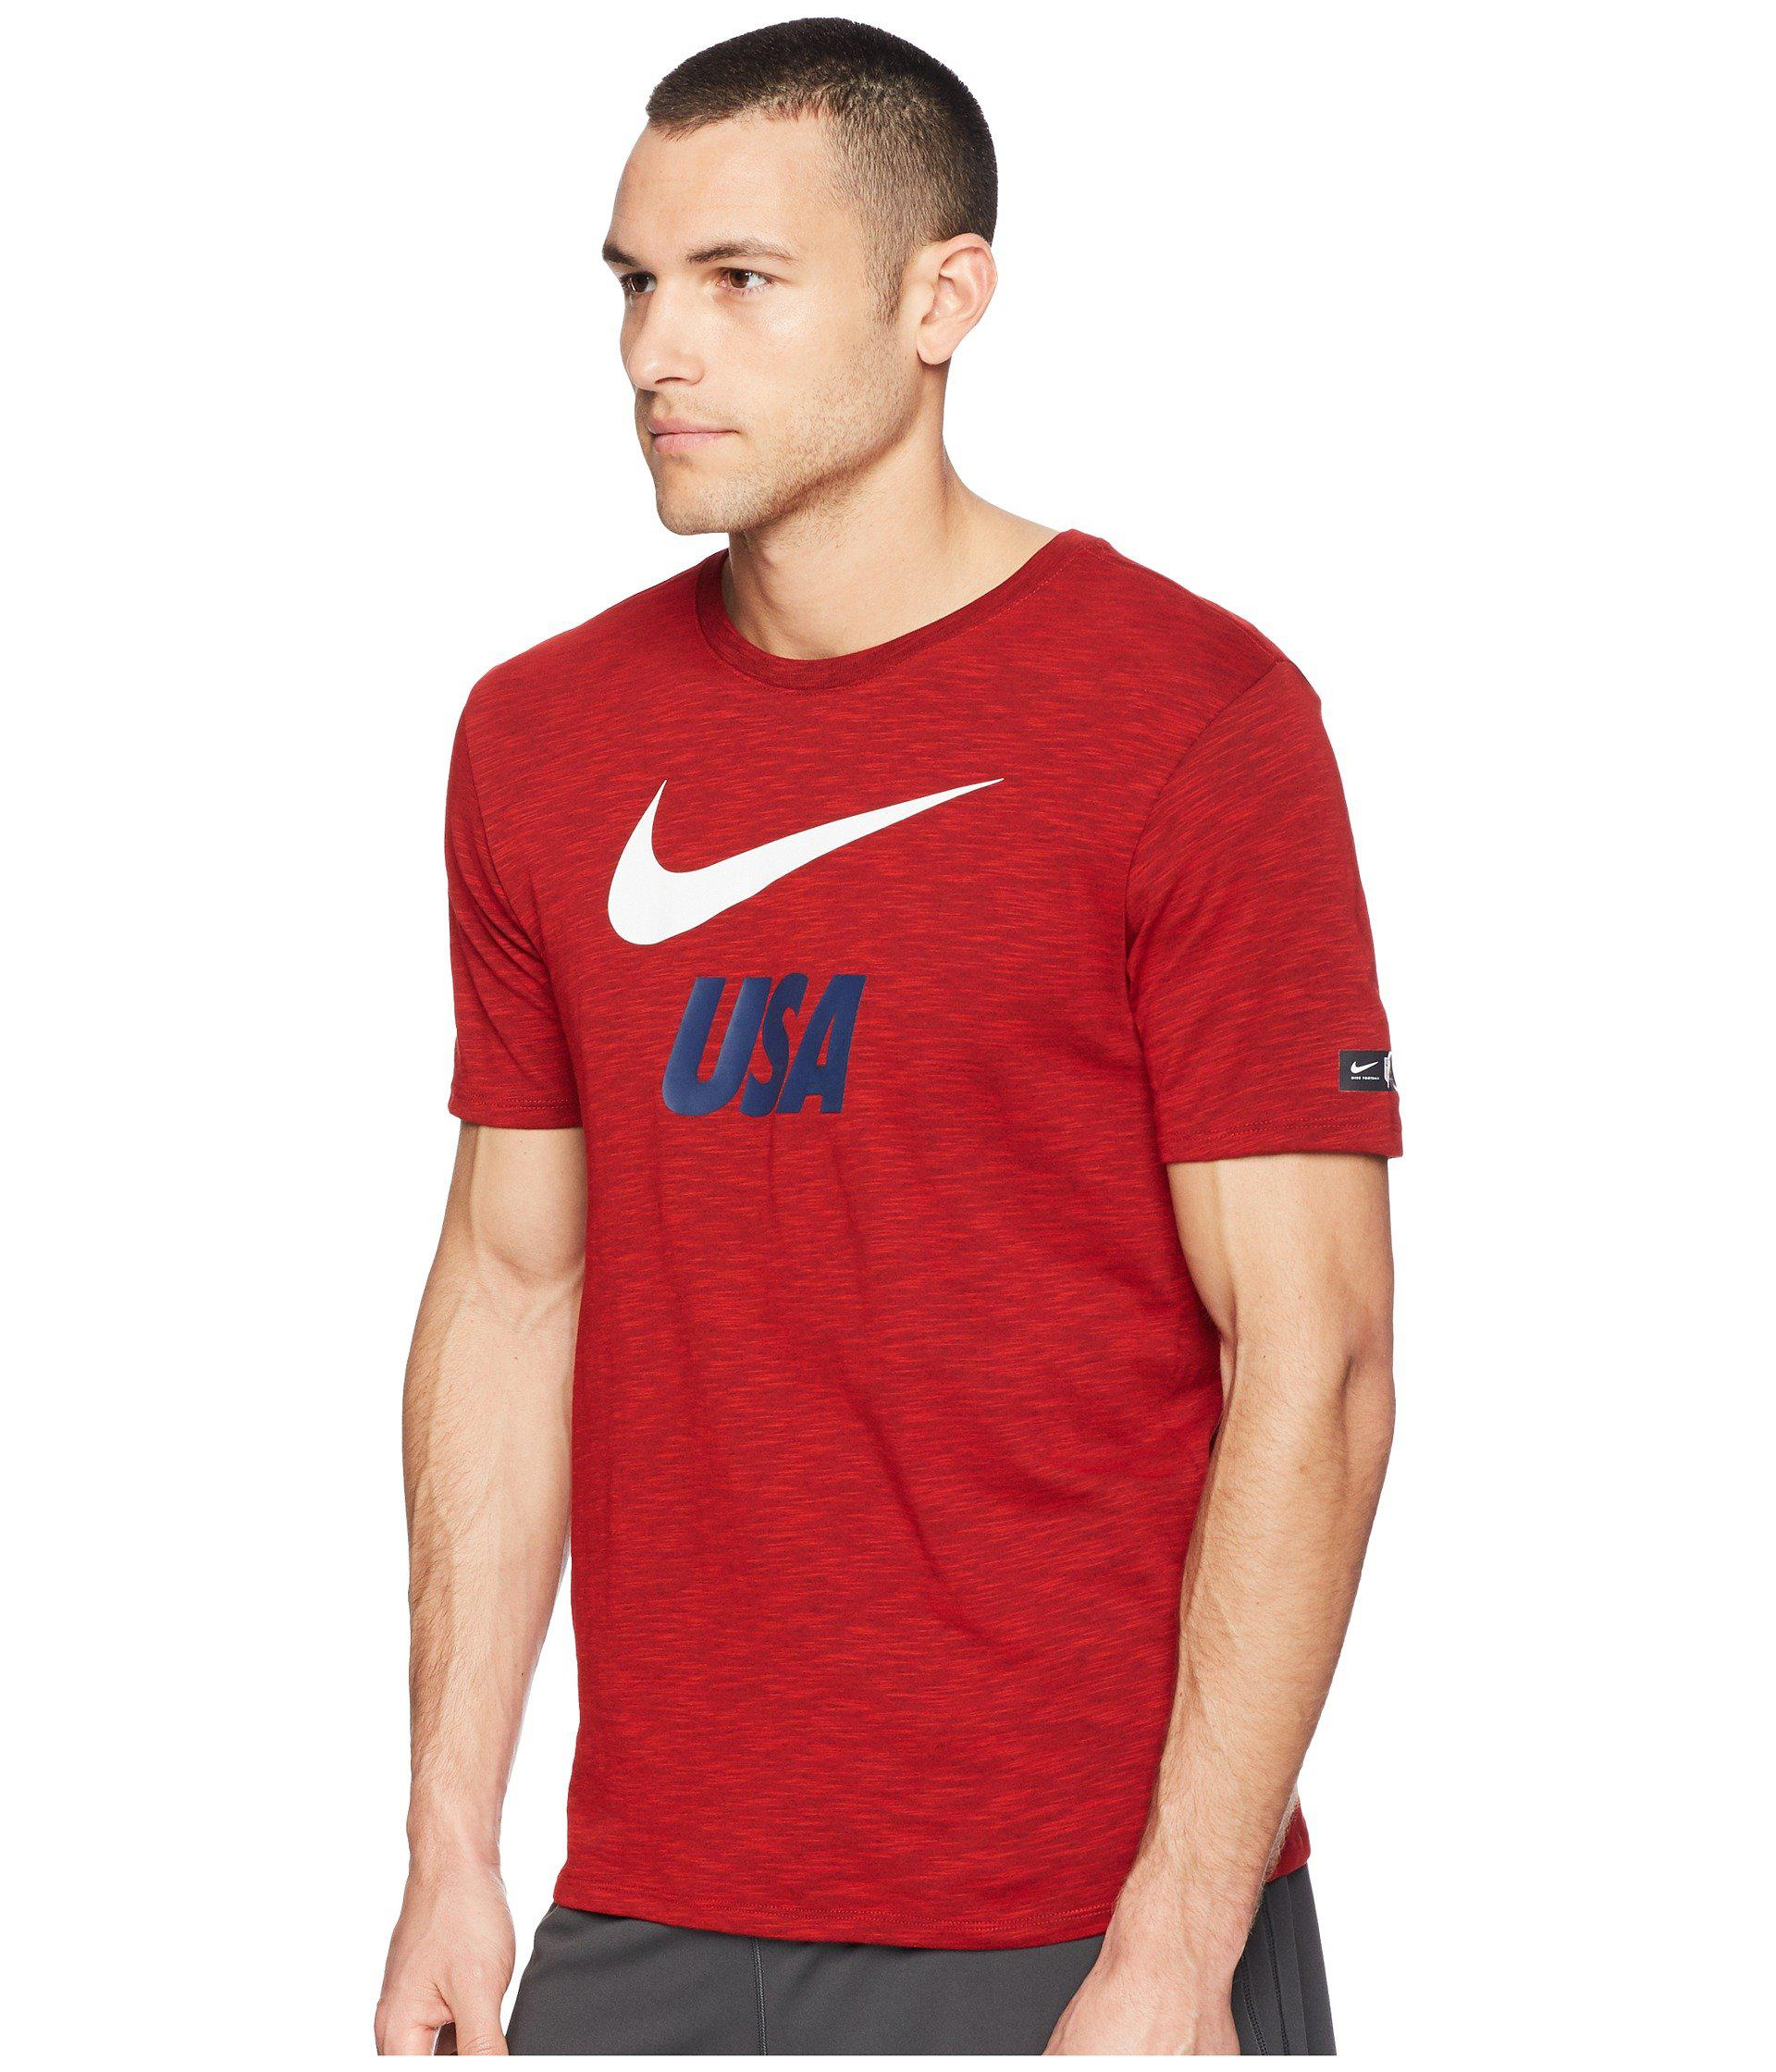 7dfd10a26e4f3 Lyst - Nike Usa Dry Tee Slub Preseason (university Red) Men s T Shirt in  Red for Men